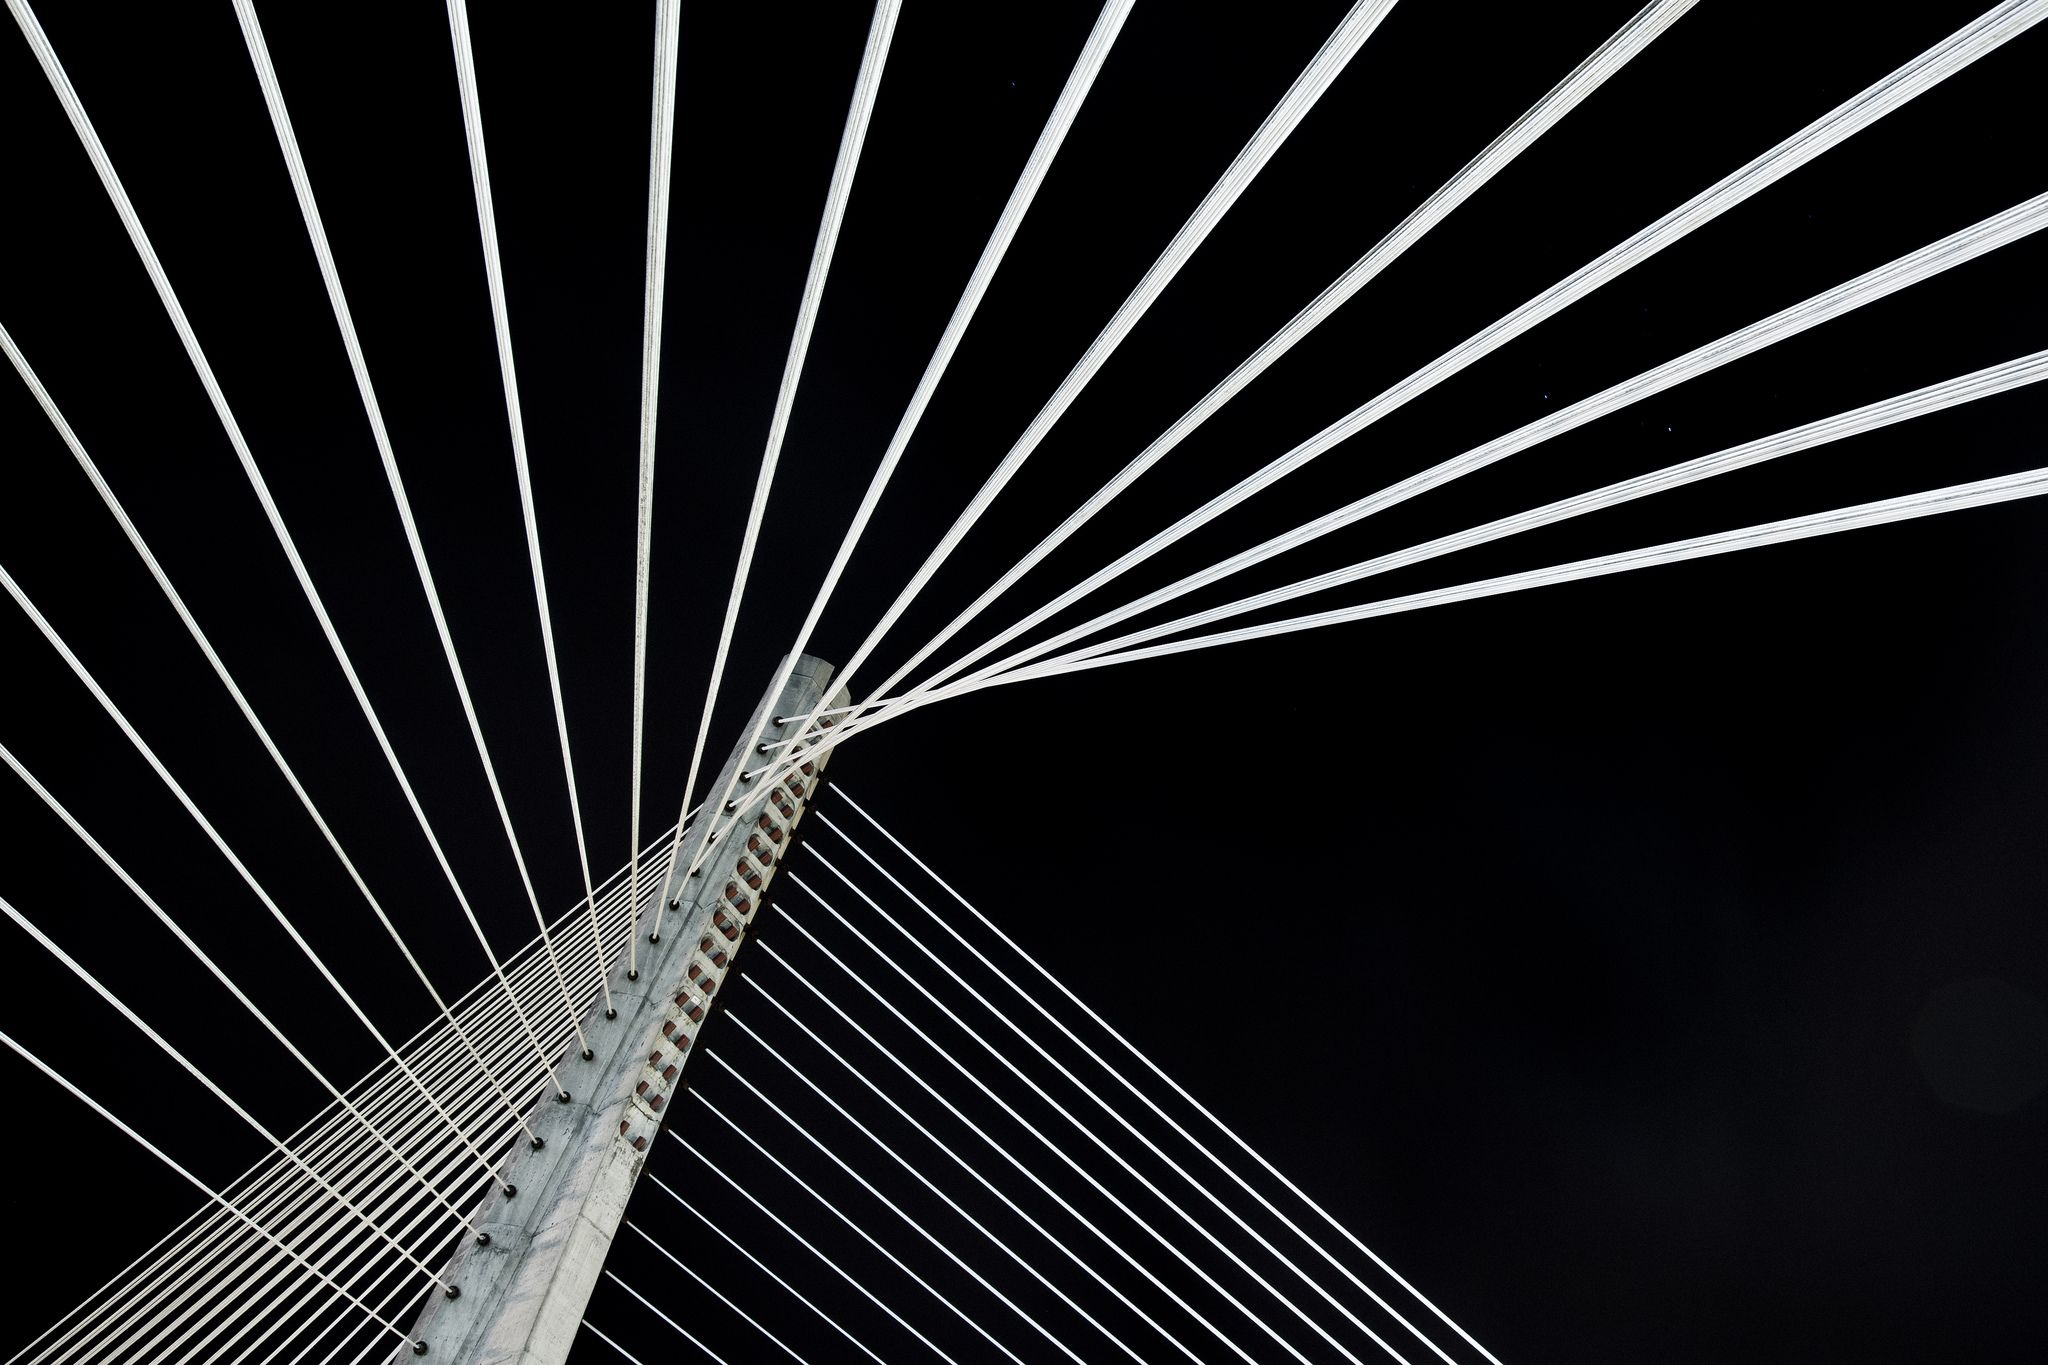 https://flic.kr/p/fEgpoZ | Puente de los Tirantes | Pontevedra